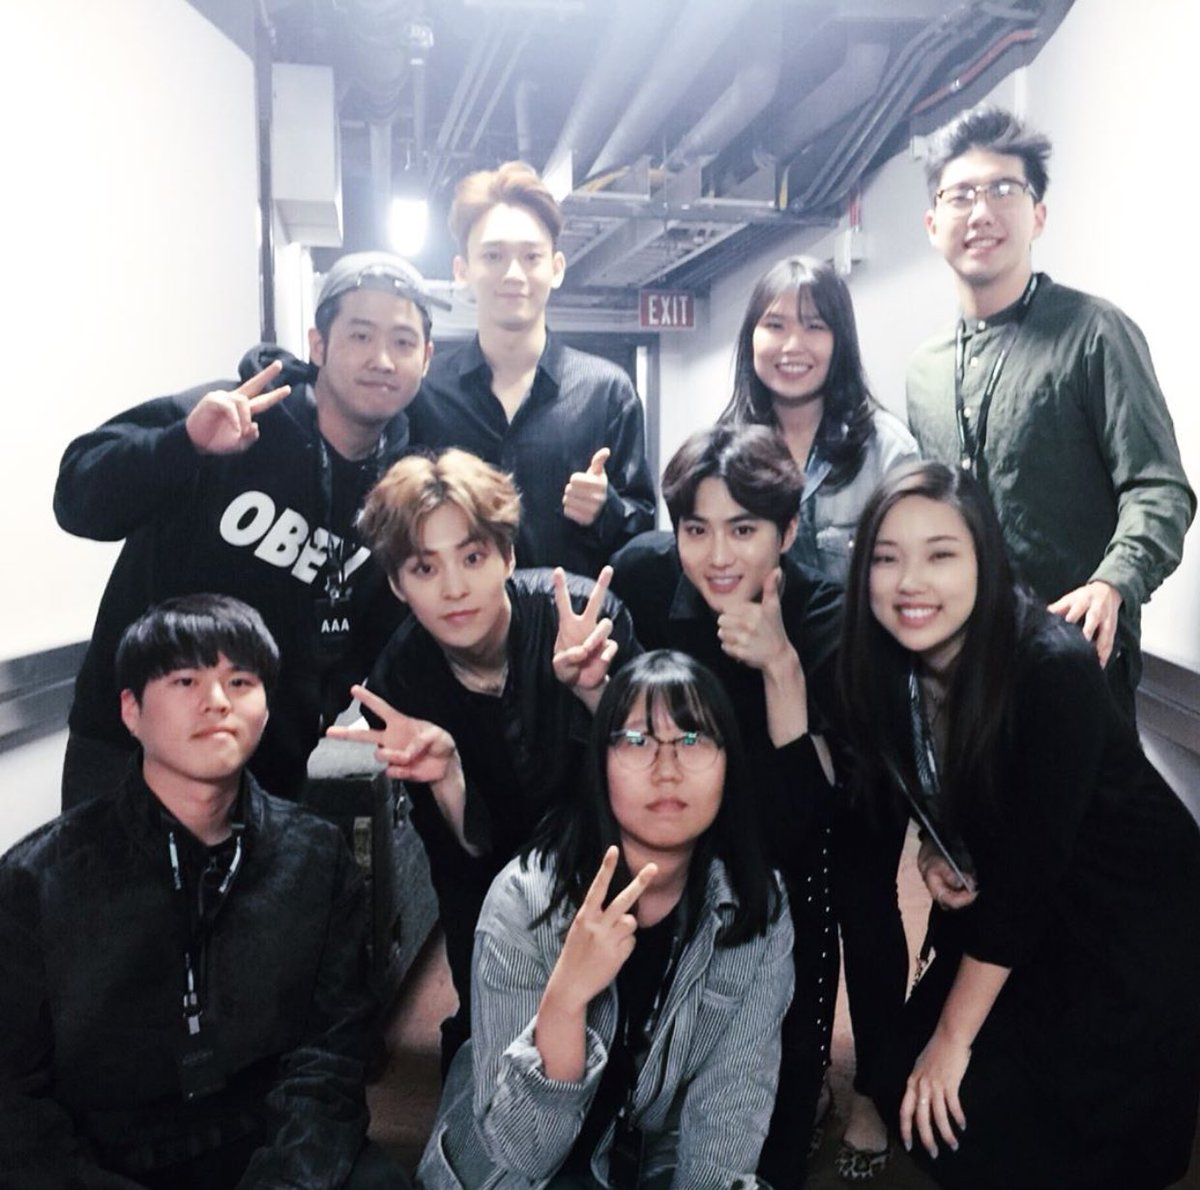 [TRANS]  170430 joyciekim Instagram Update with suho, Xiumin and Chen